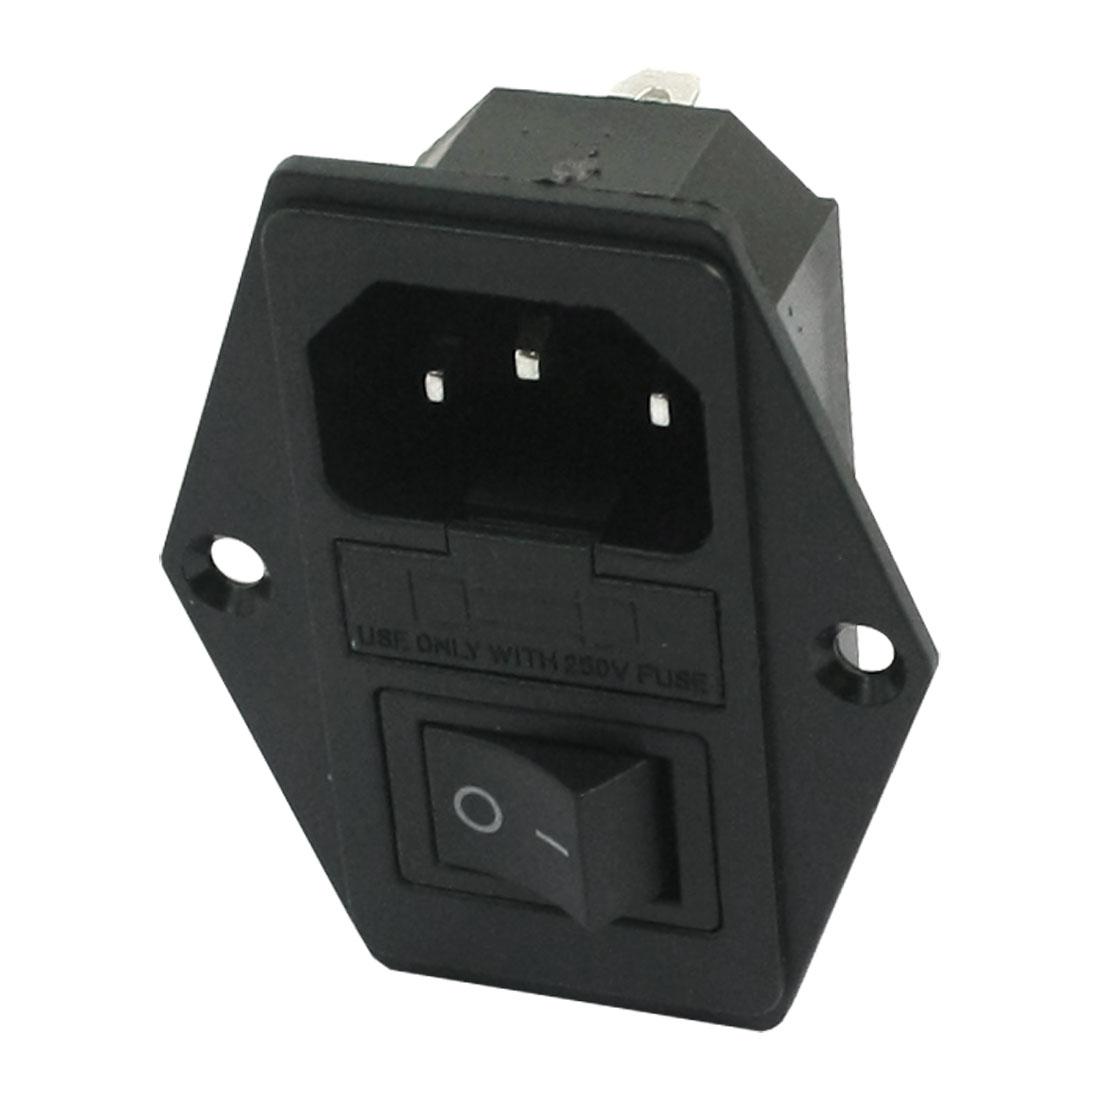 AC 250V 10A 5x20mm Fuse Holder Rocker Switch IEC320 C14 Male Inlet Power Socket Black